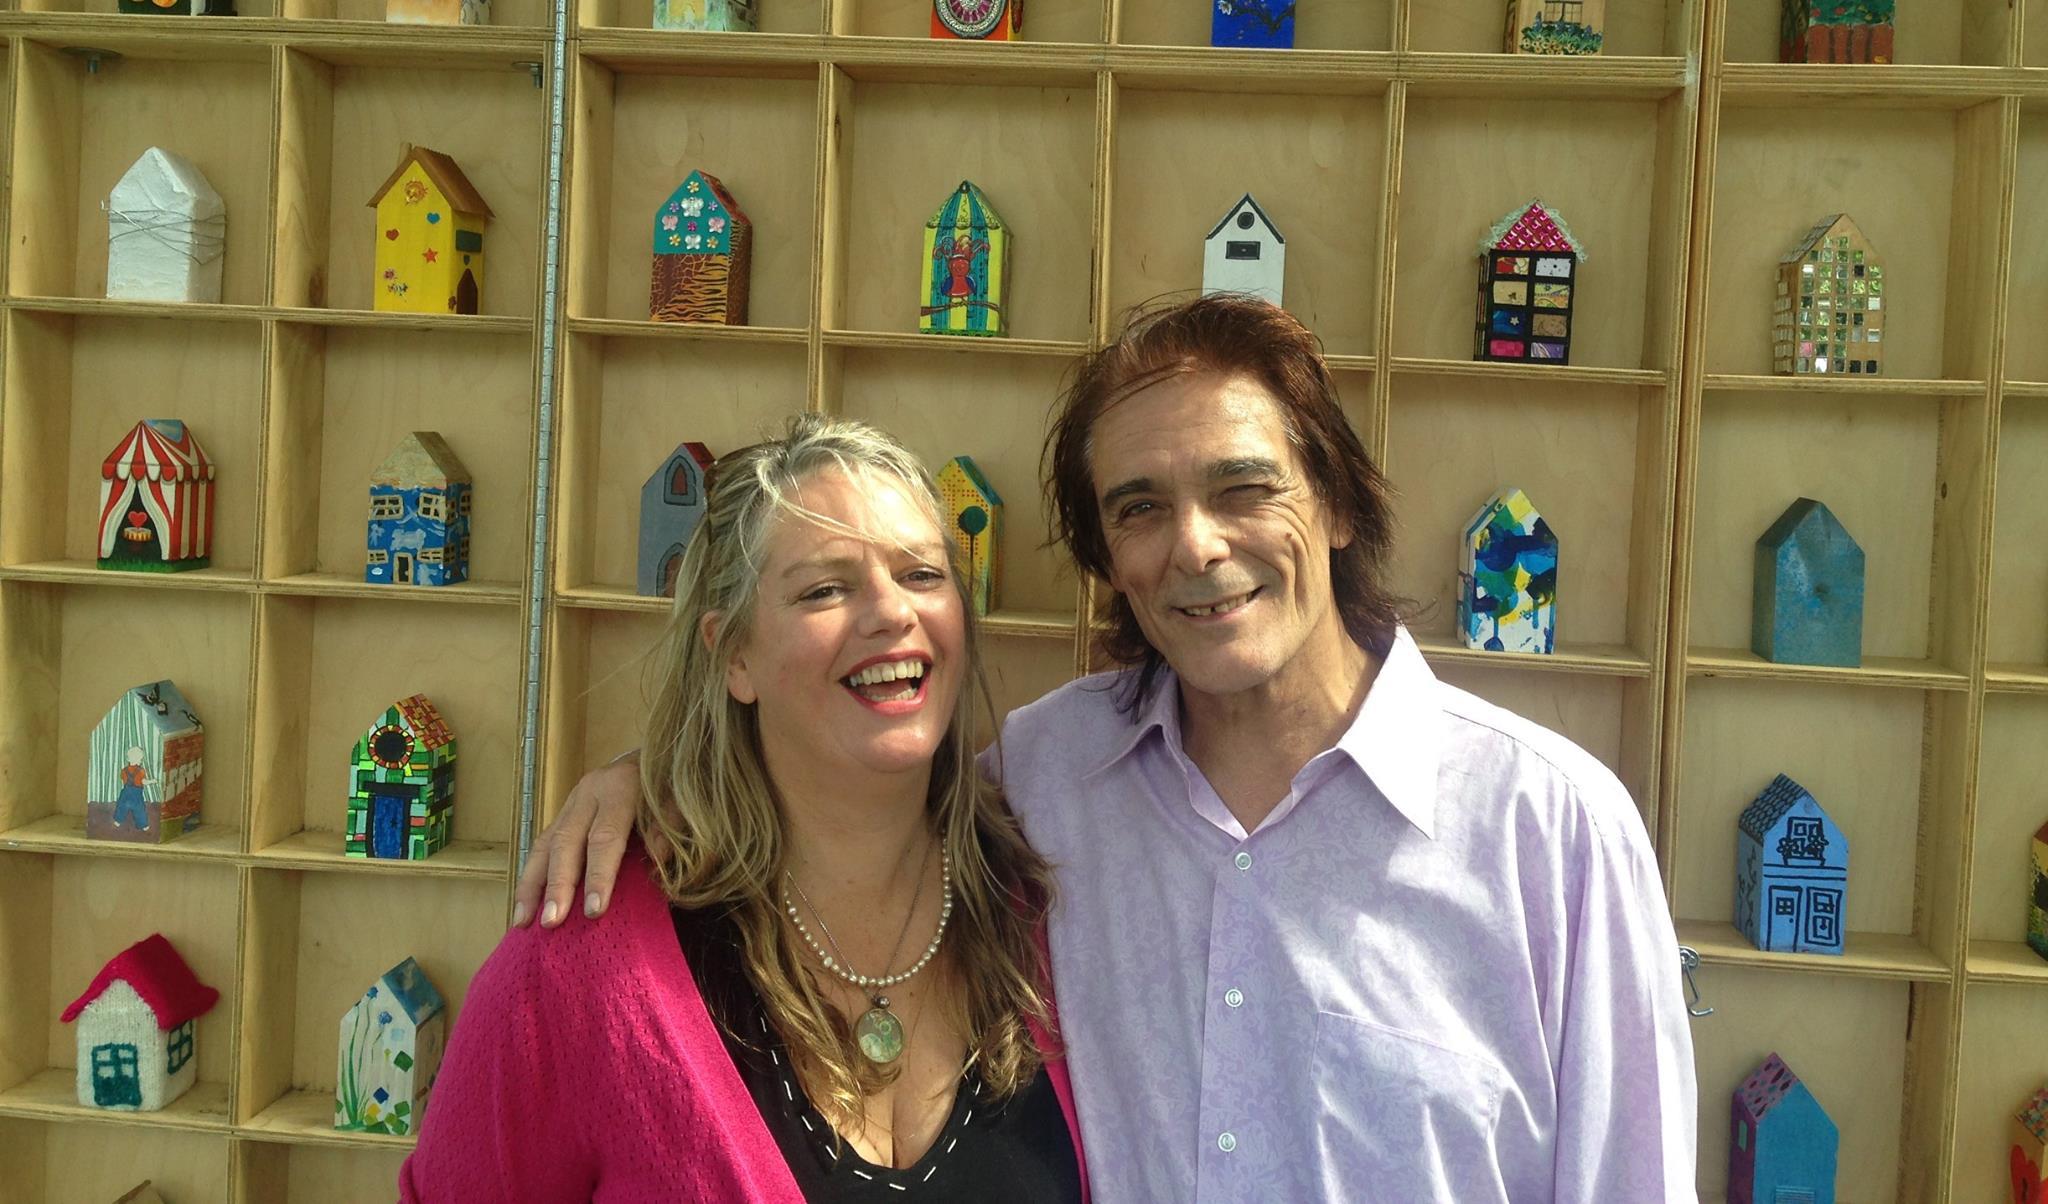 Rebecca & Billy's Sing-a-long Society